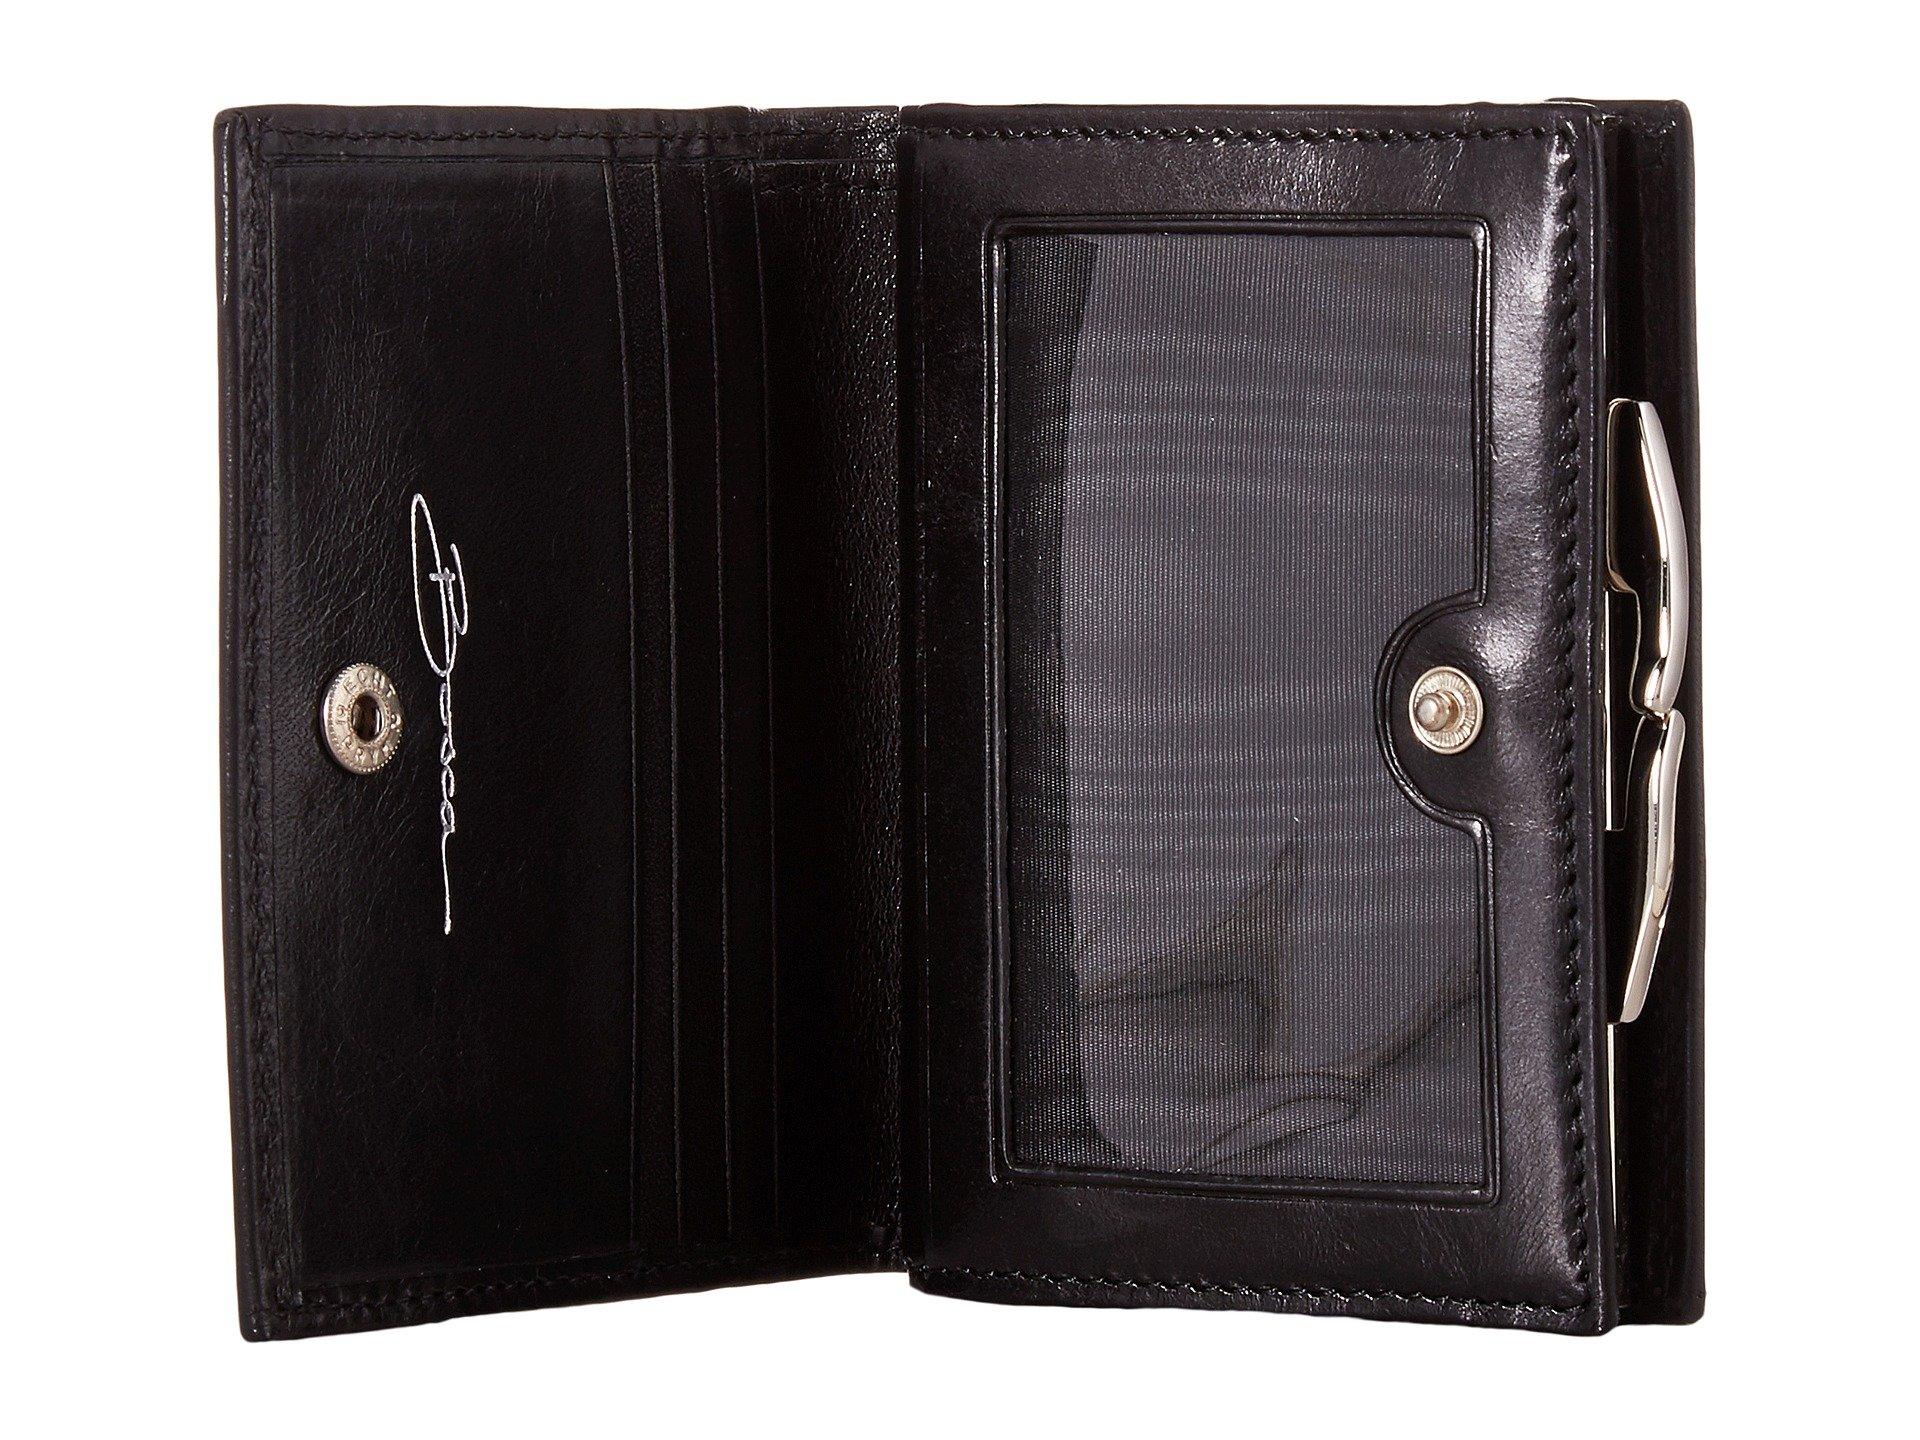 Frame Leather Petite Purse French Bosca Old Black EqHn44